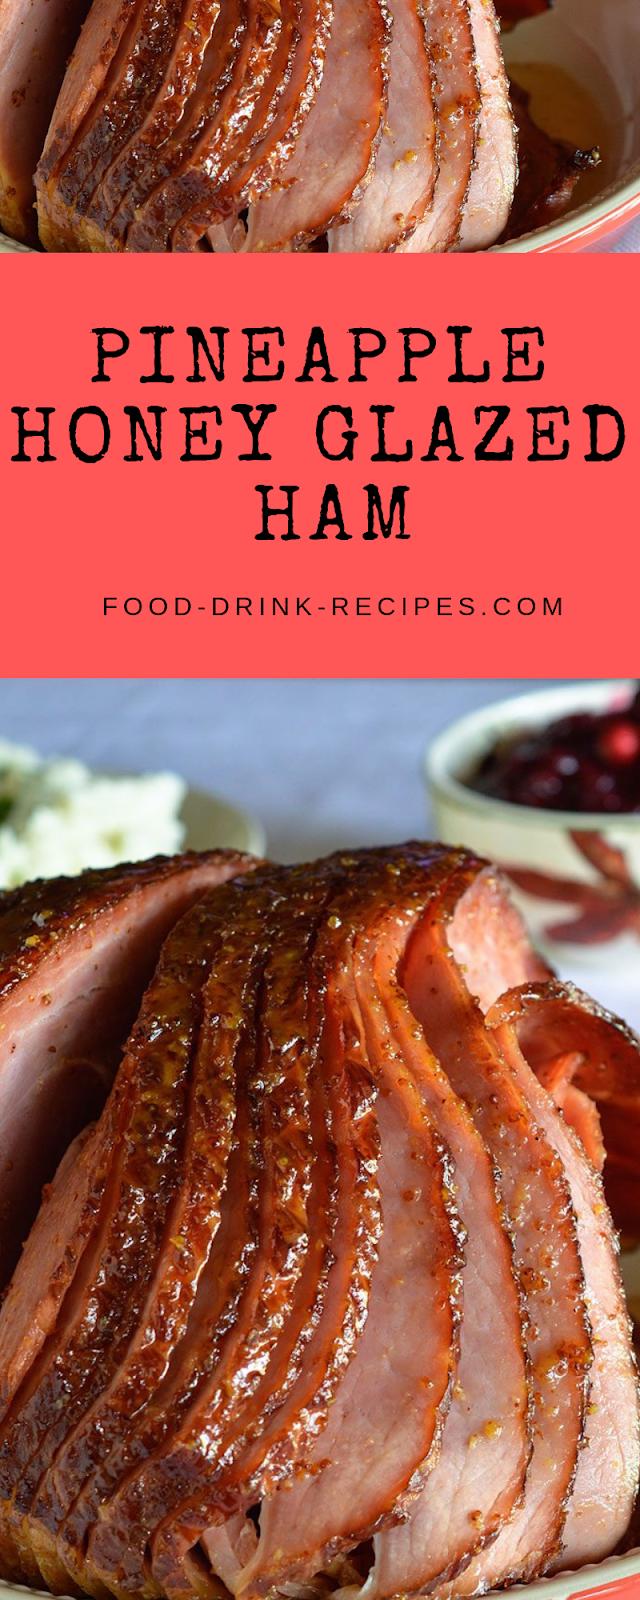 Pineapple Honey Glazed Ham Recipe - food-drink-recipes.com